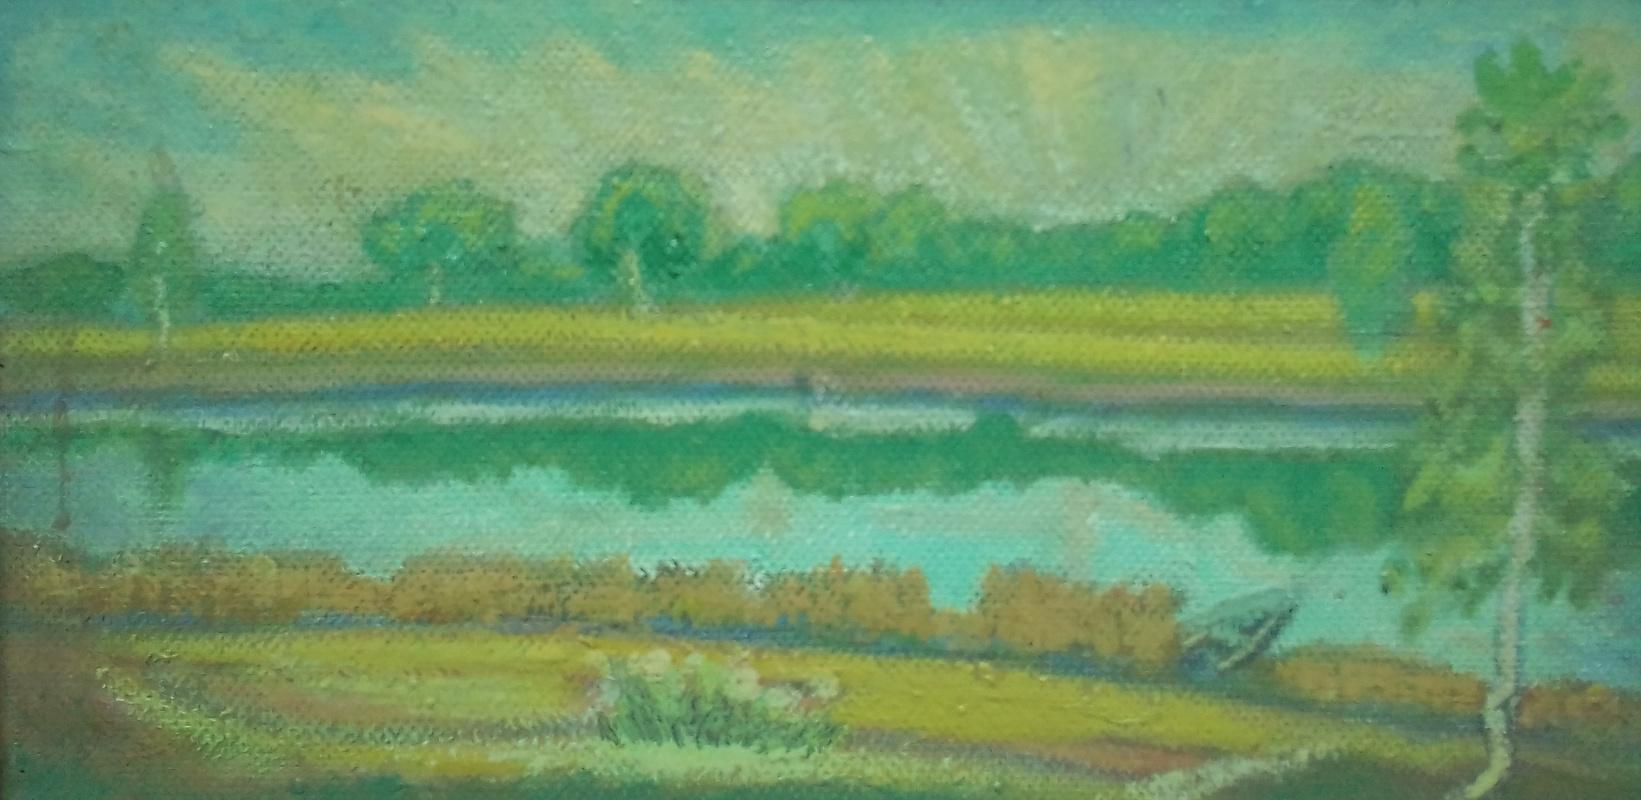 Вячеслав Коренев. By the river